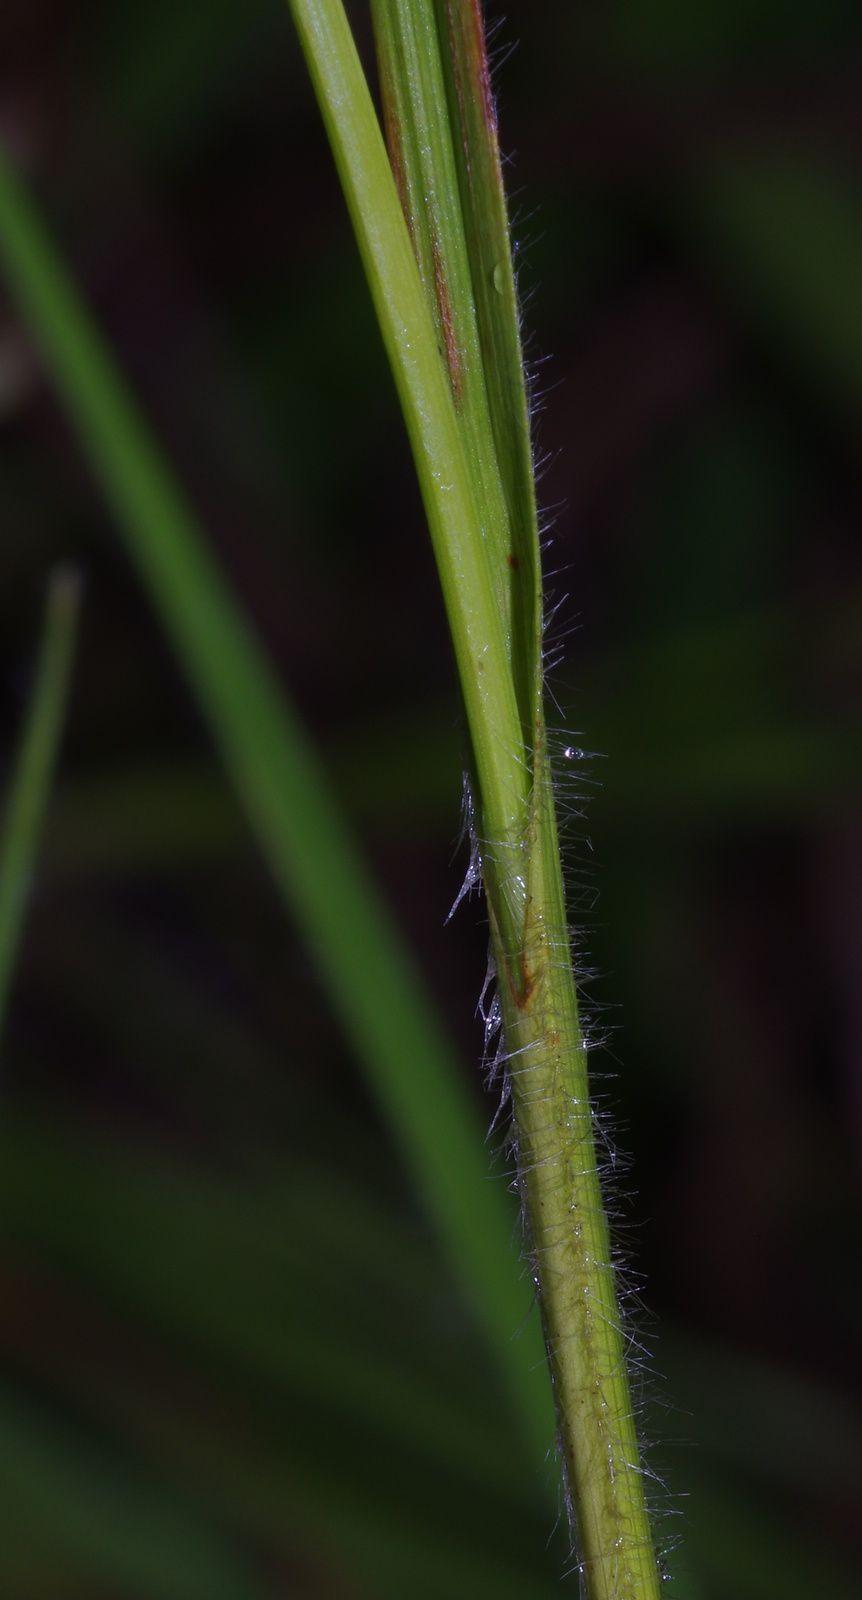 Rhynchospora subdicephala